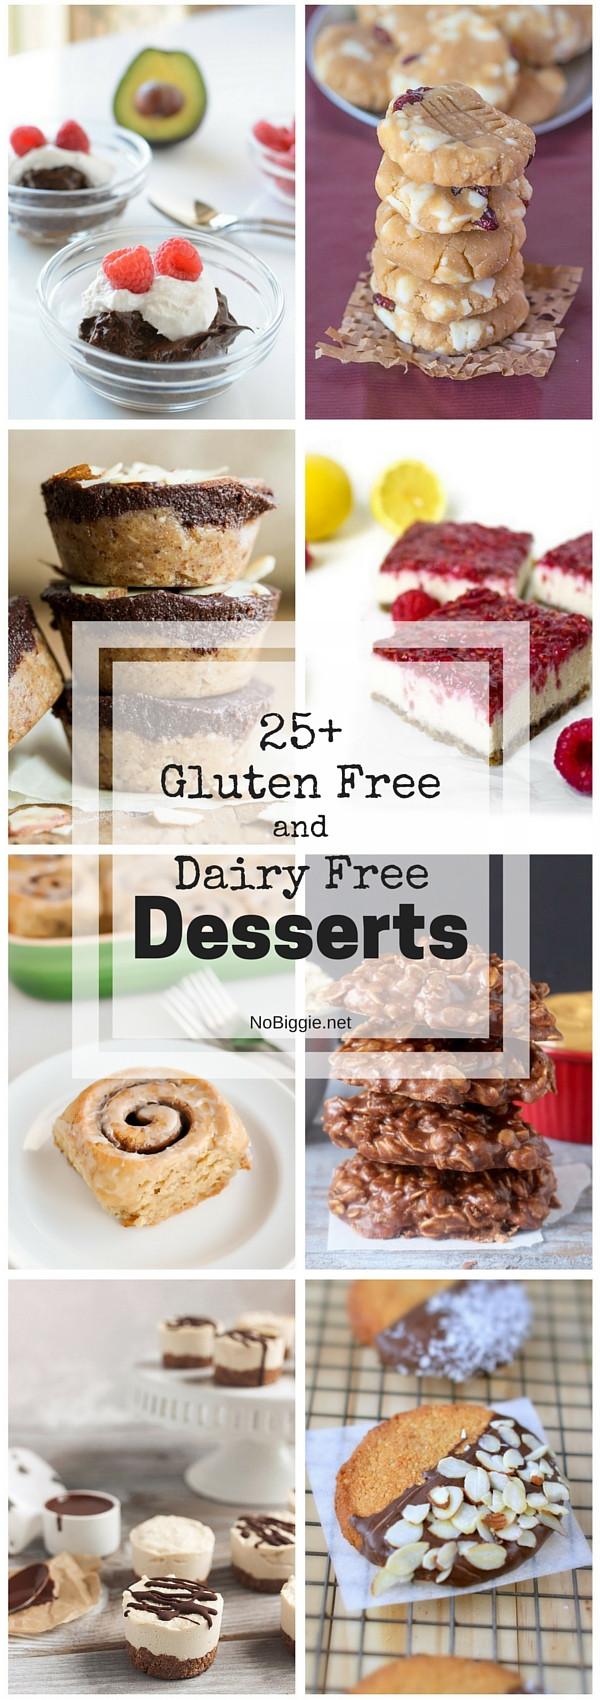 Gluten And Dairy Free Desserts  25 Gluten Free and Dairy Free Desserts